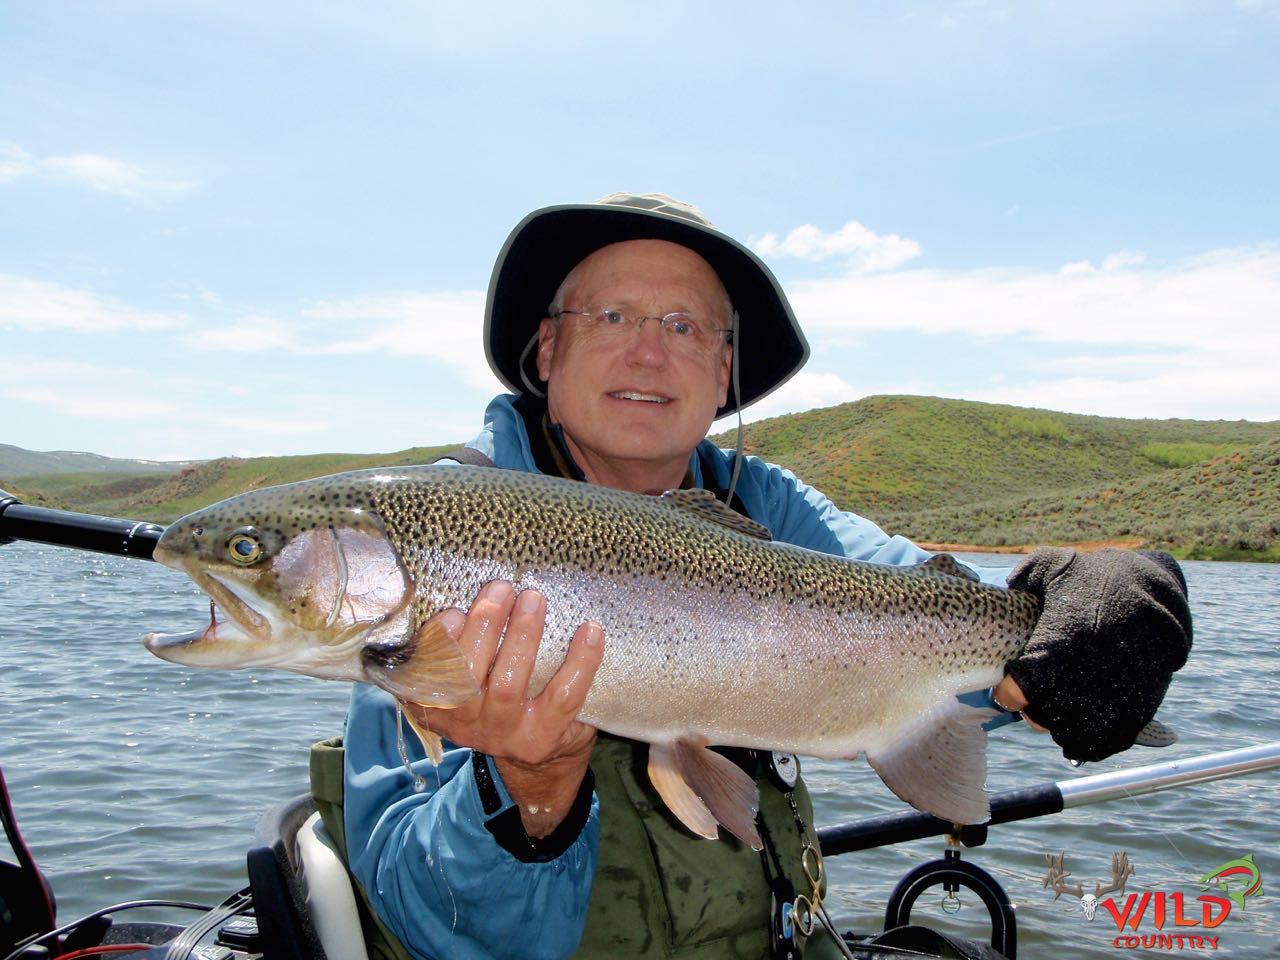 fly fishing utah rainbow trout - 32.jpg